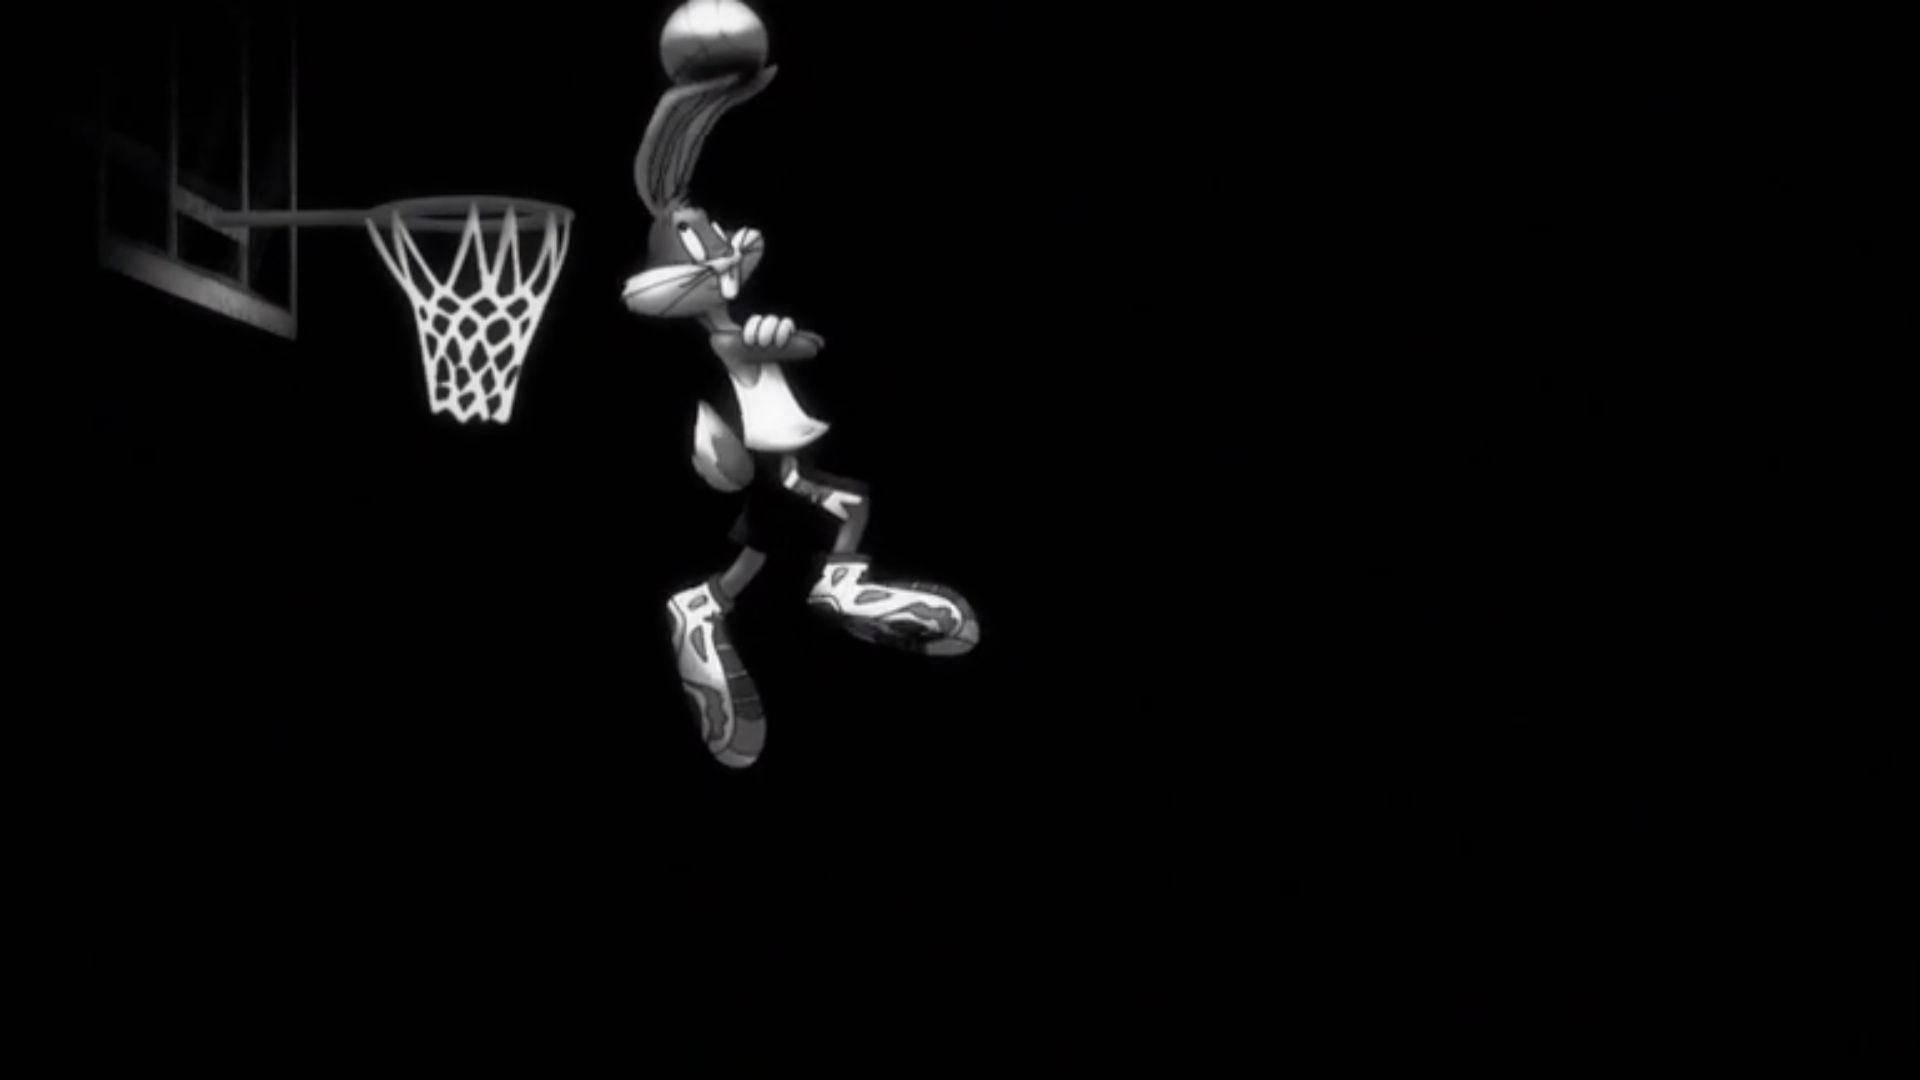 Watch Nike's new Hare Jordan 7 commercial | NBA | Sporting ...